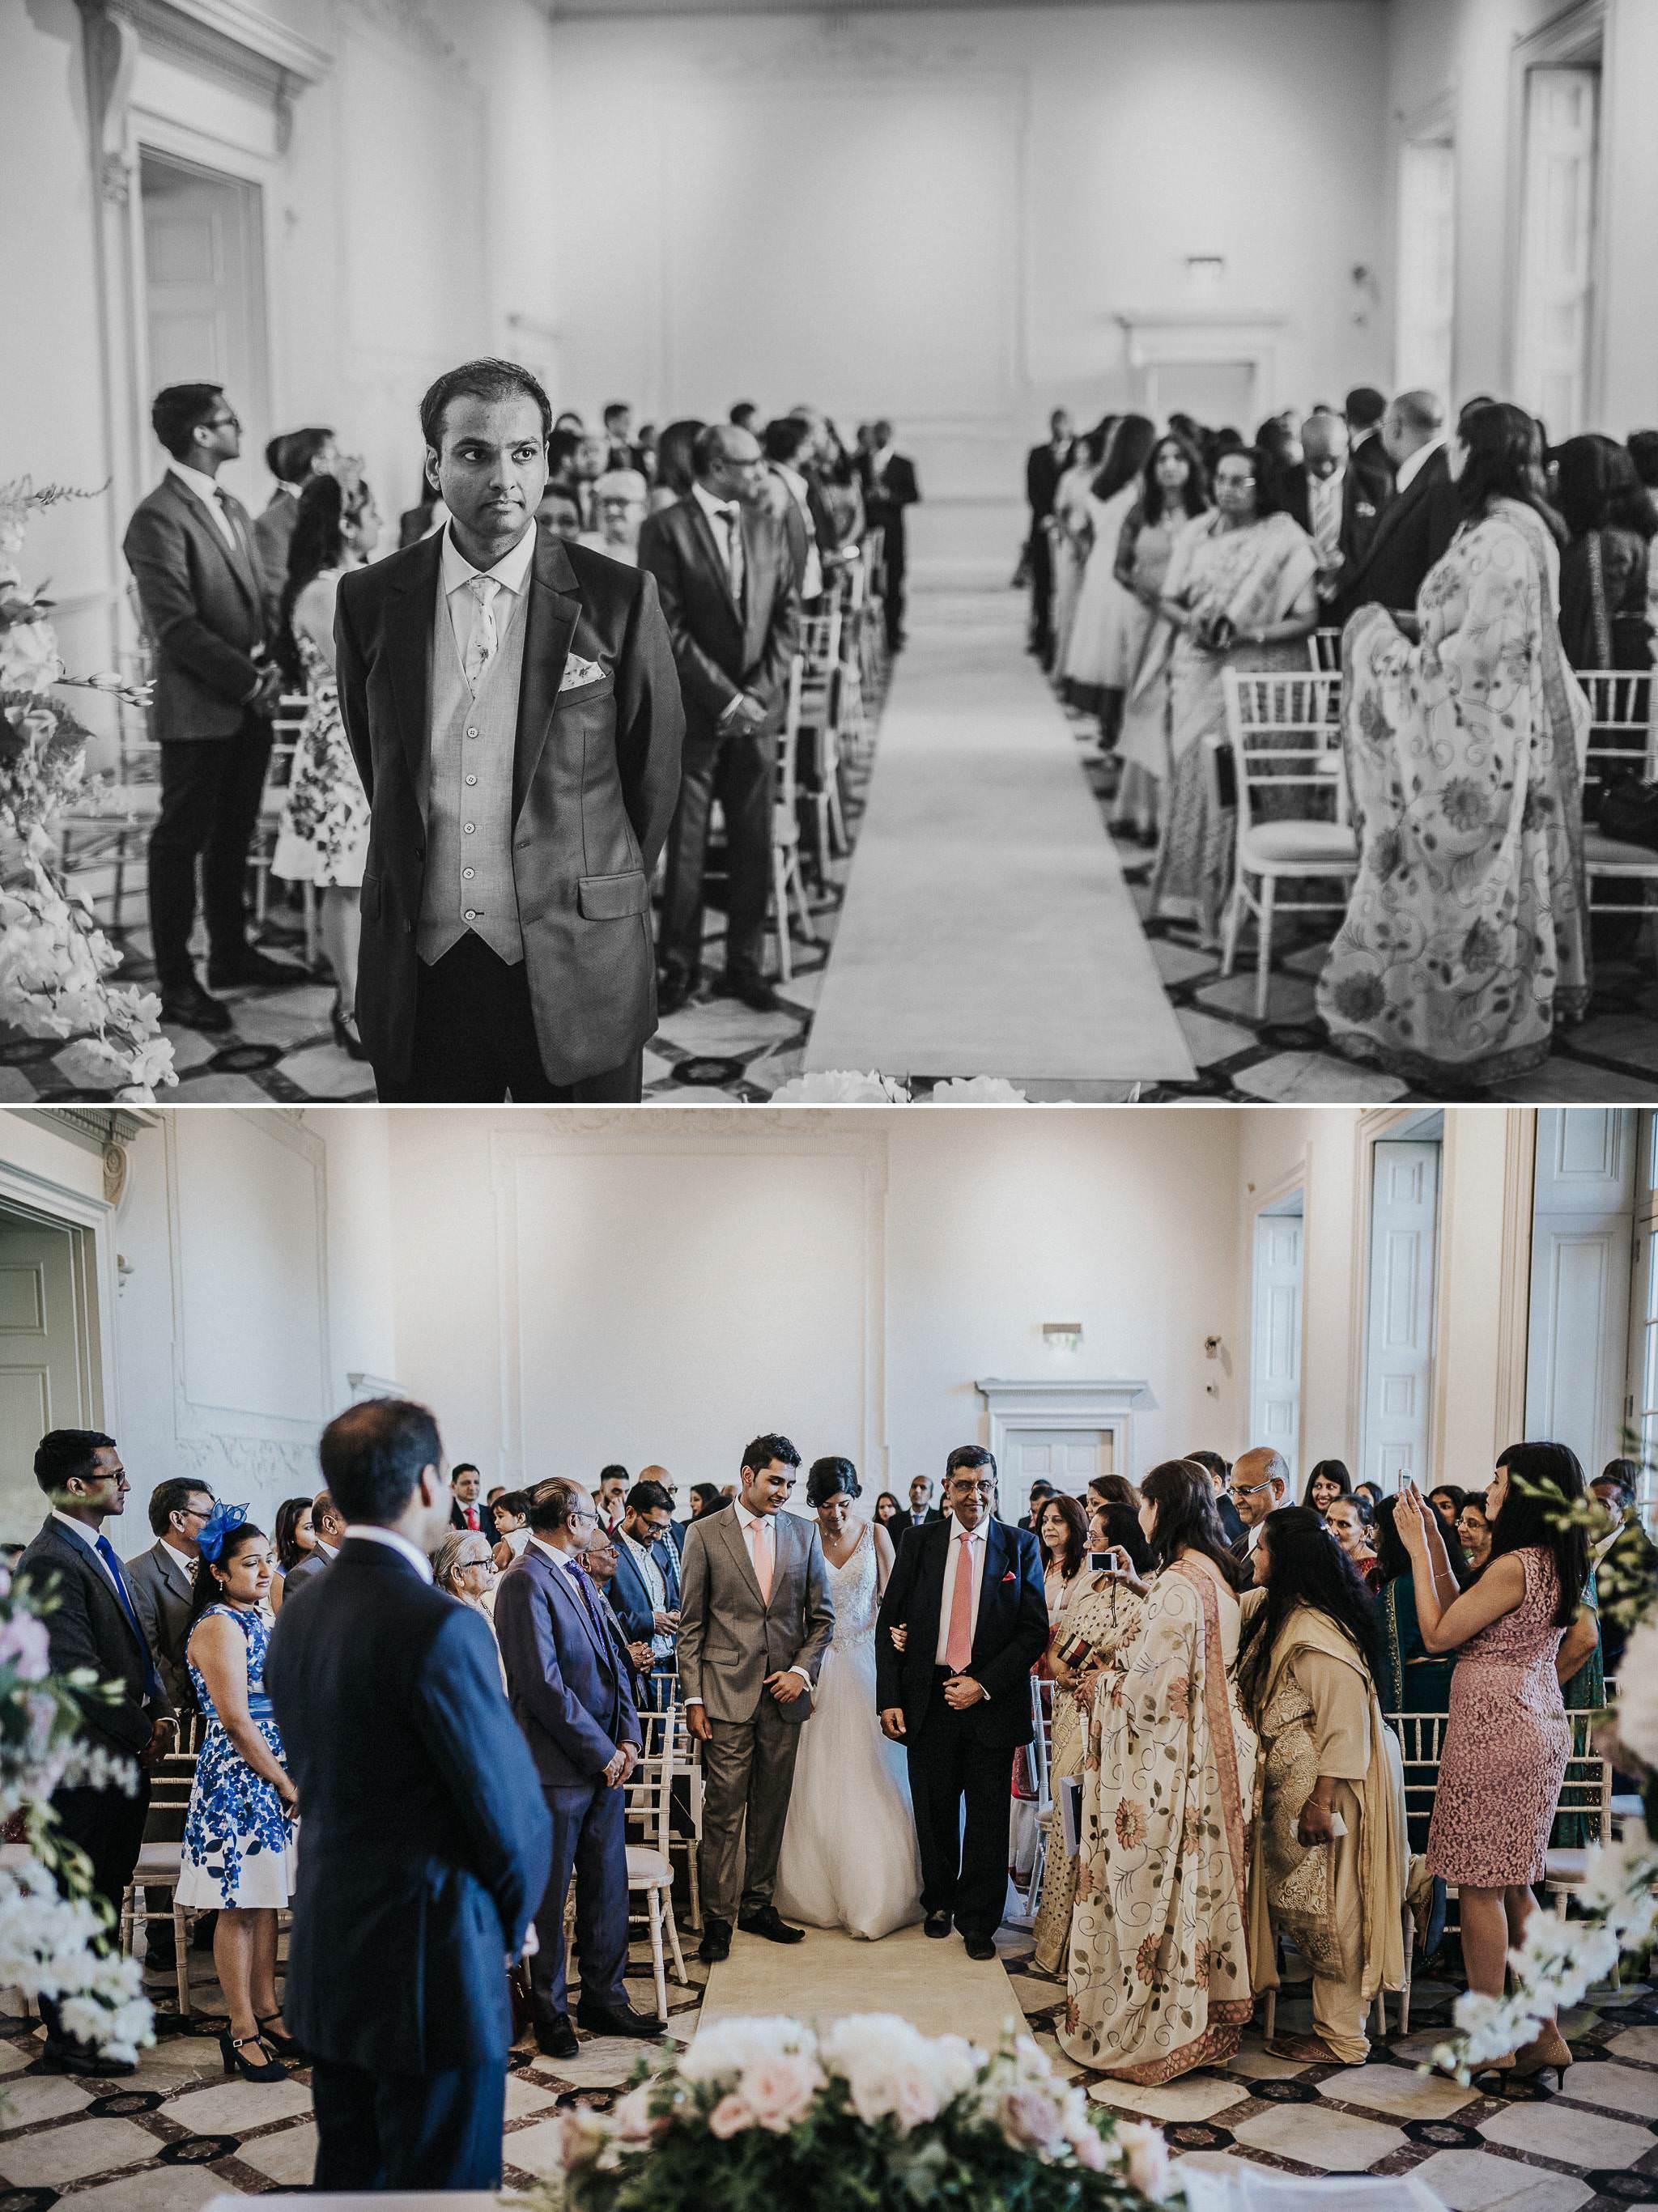 compton-verney-wedding-photos 13.jpg